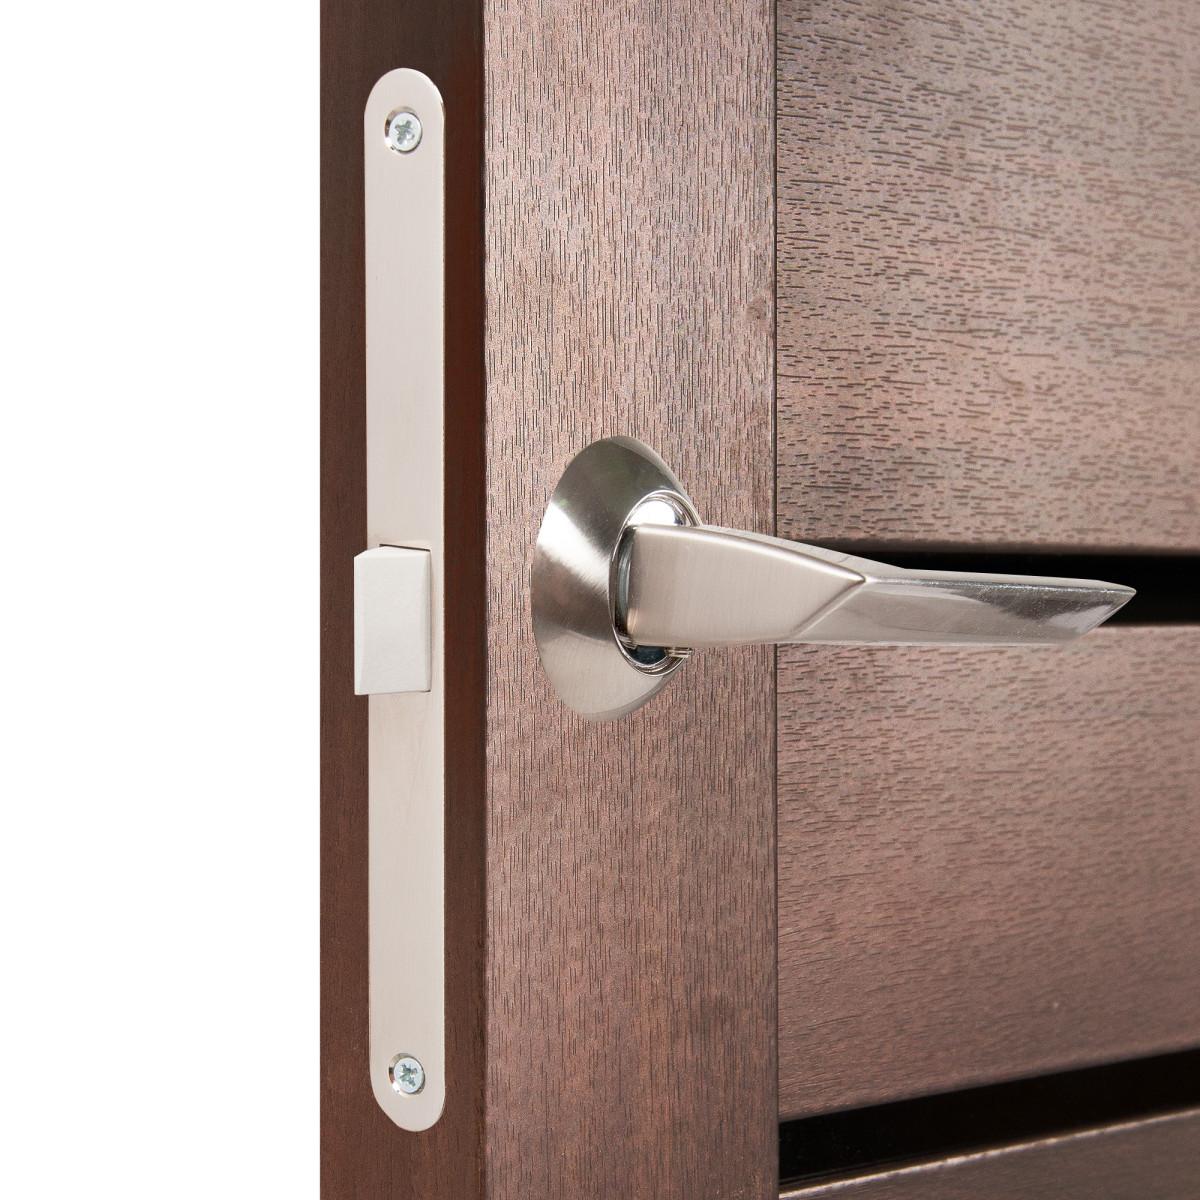 Дверь Межкомнатная Глухая Artens Велдон 60x200 Цвет Мокко Без Фурнитуры